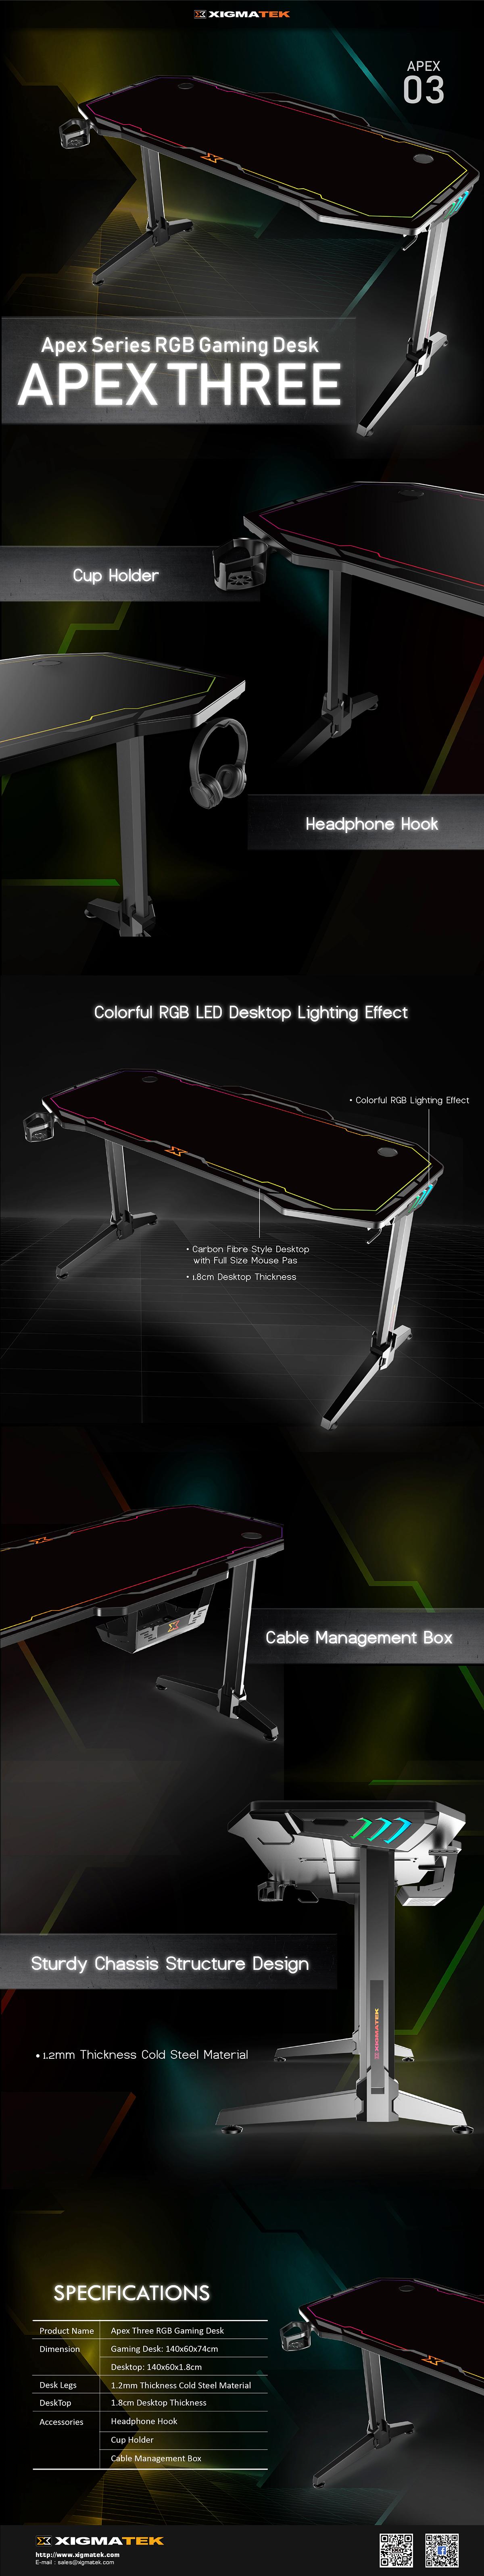 Xigmatek Apex Series RGB Gaming Desk APEX THREE - EN46867 4